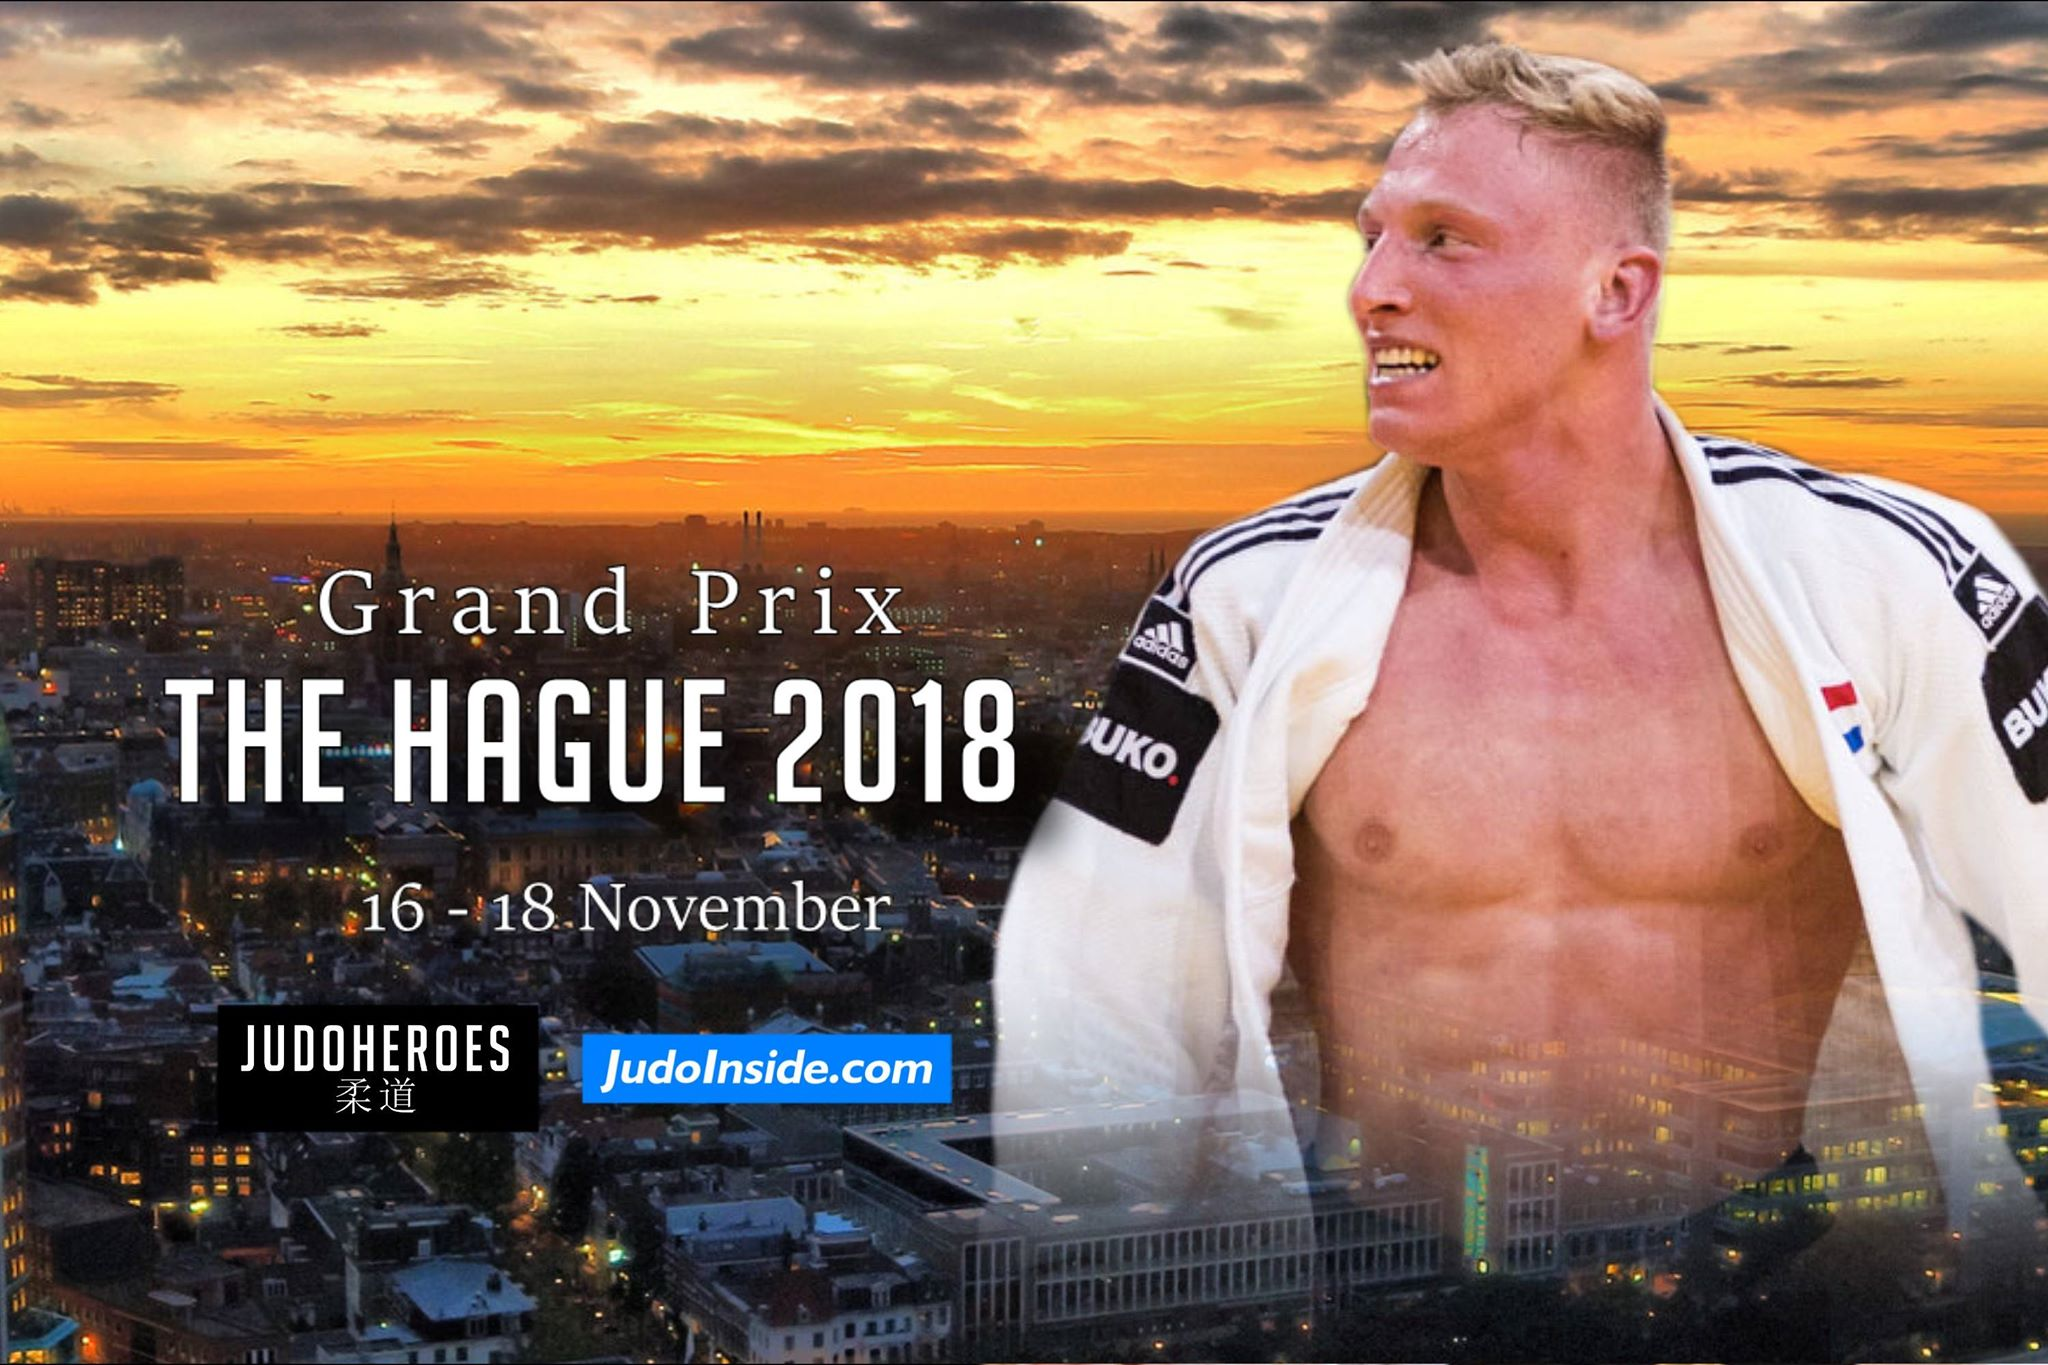 20181116_judoheroes_thehague_gp_frank_de_wit